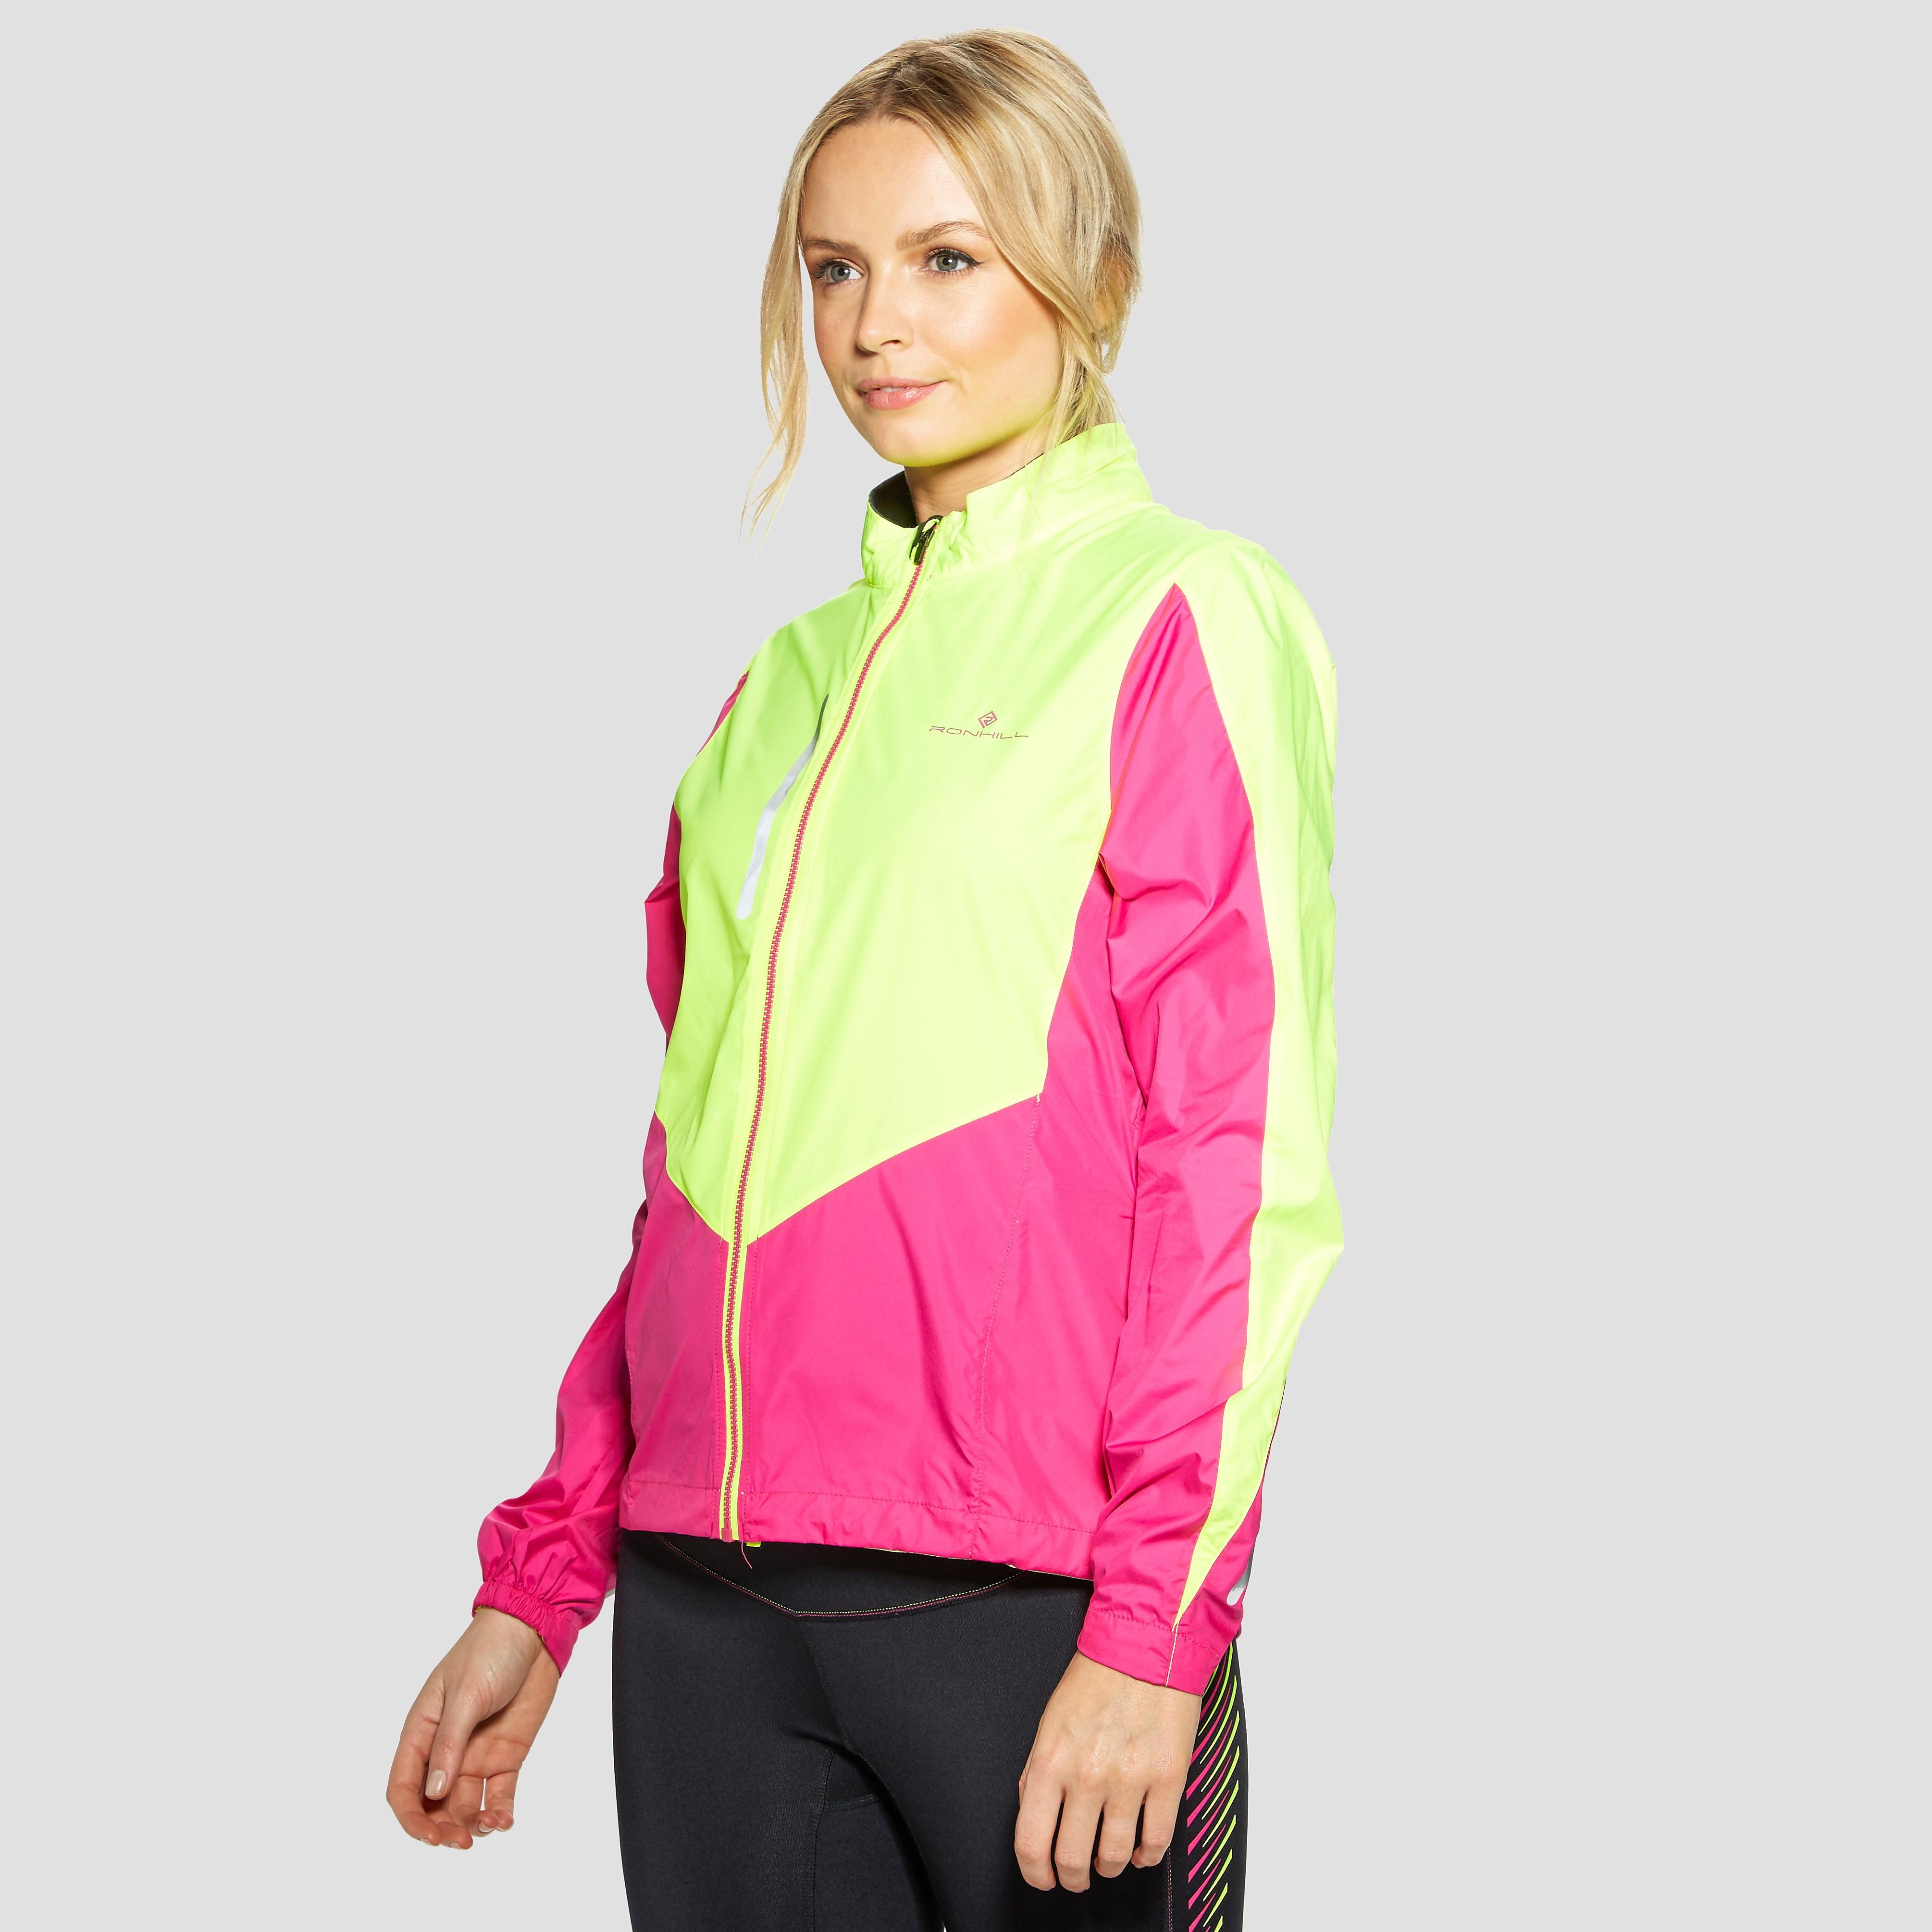 Ronhill Vizion Windlite Women's Jacket